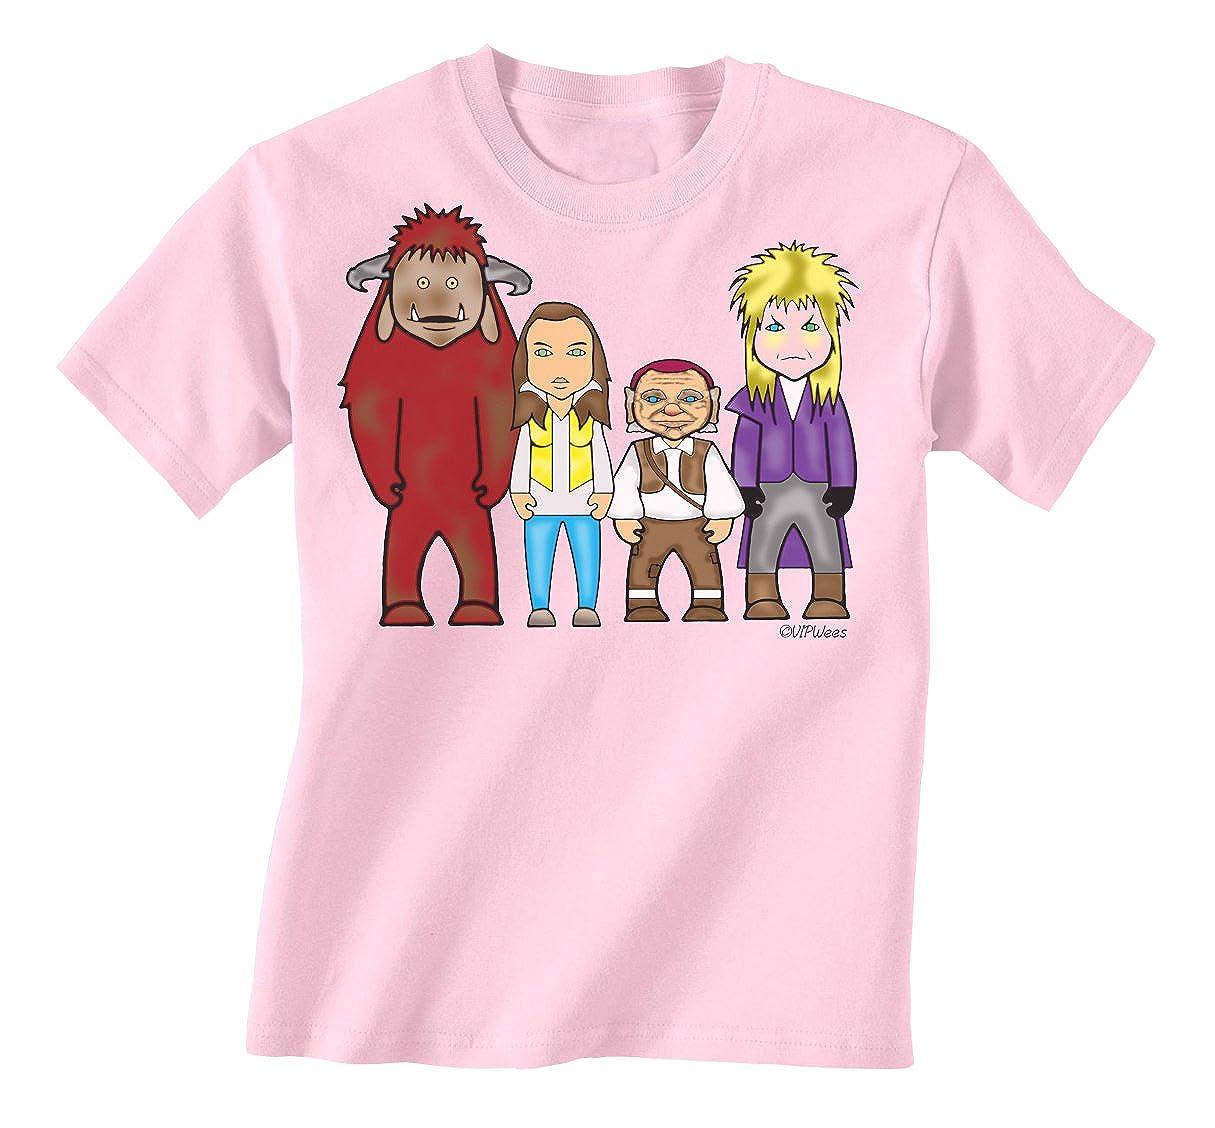 VIPwees Goblin Maze Childrens unisex kids movie T-Shirt boy/girl caricature gift